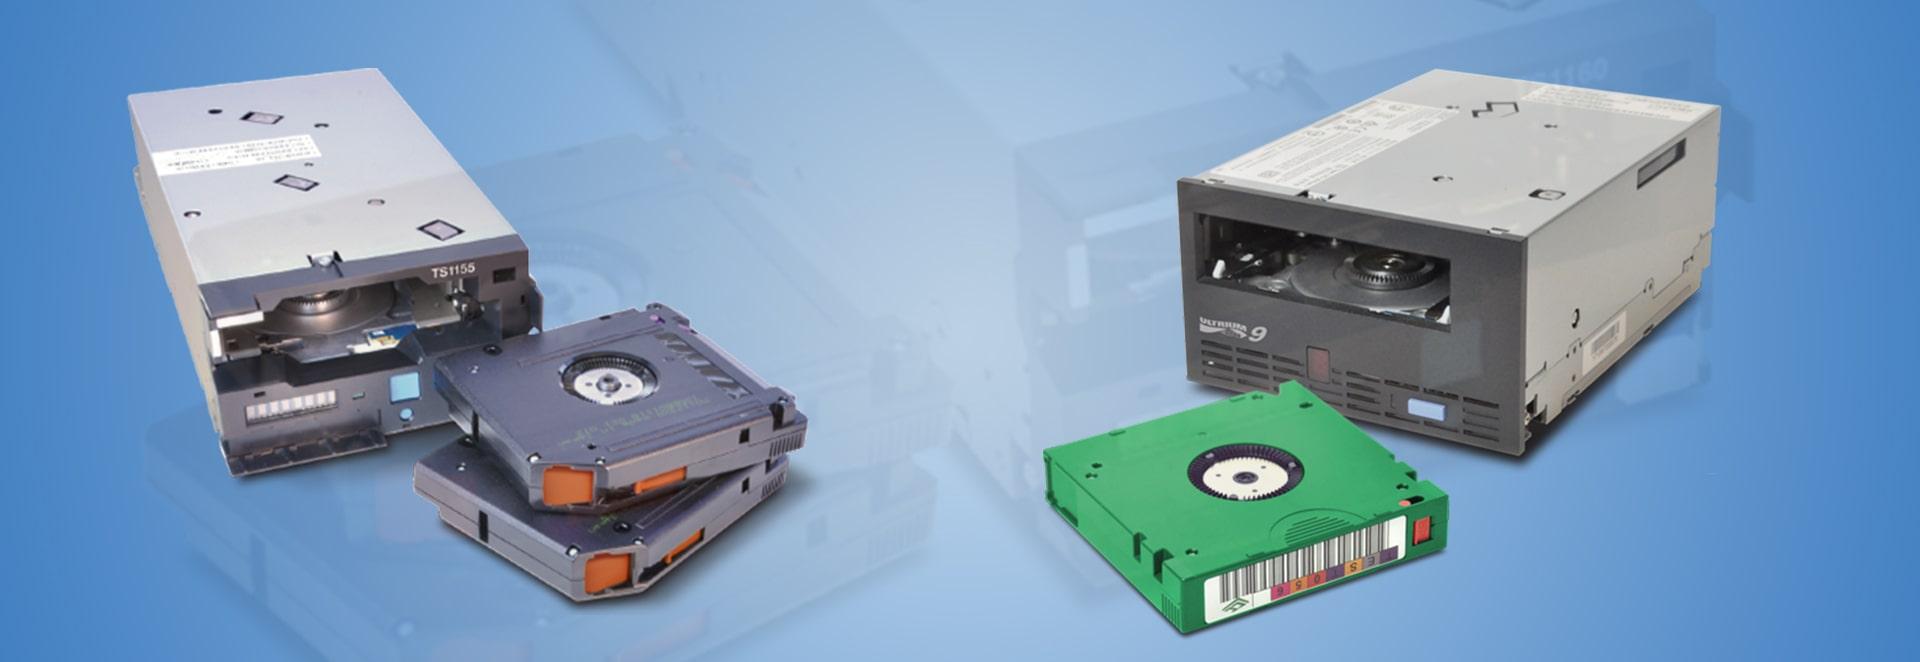 Tape Drive Recovery & Repair